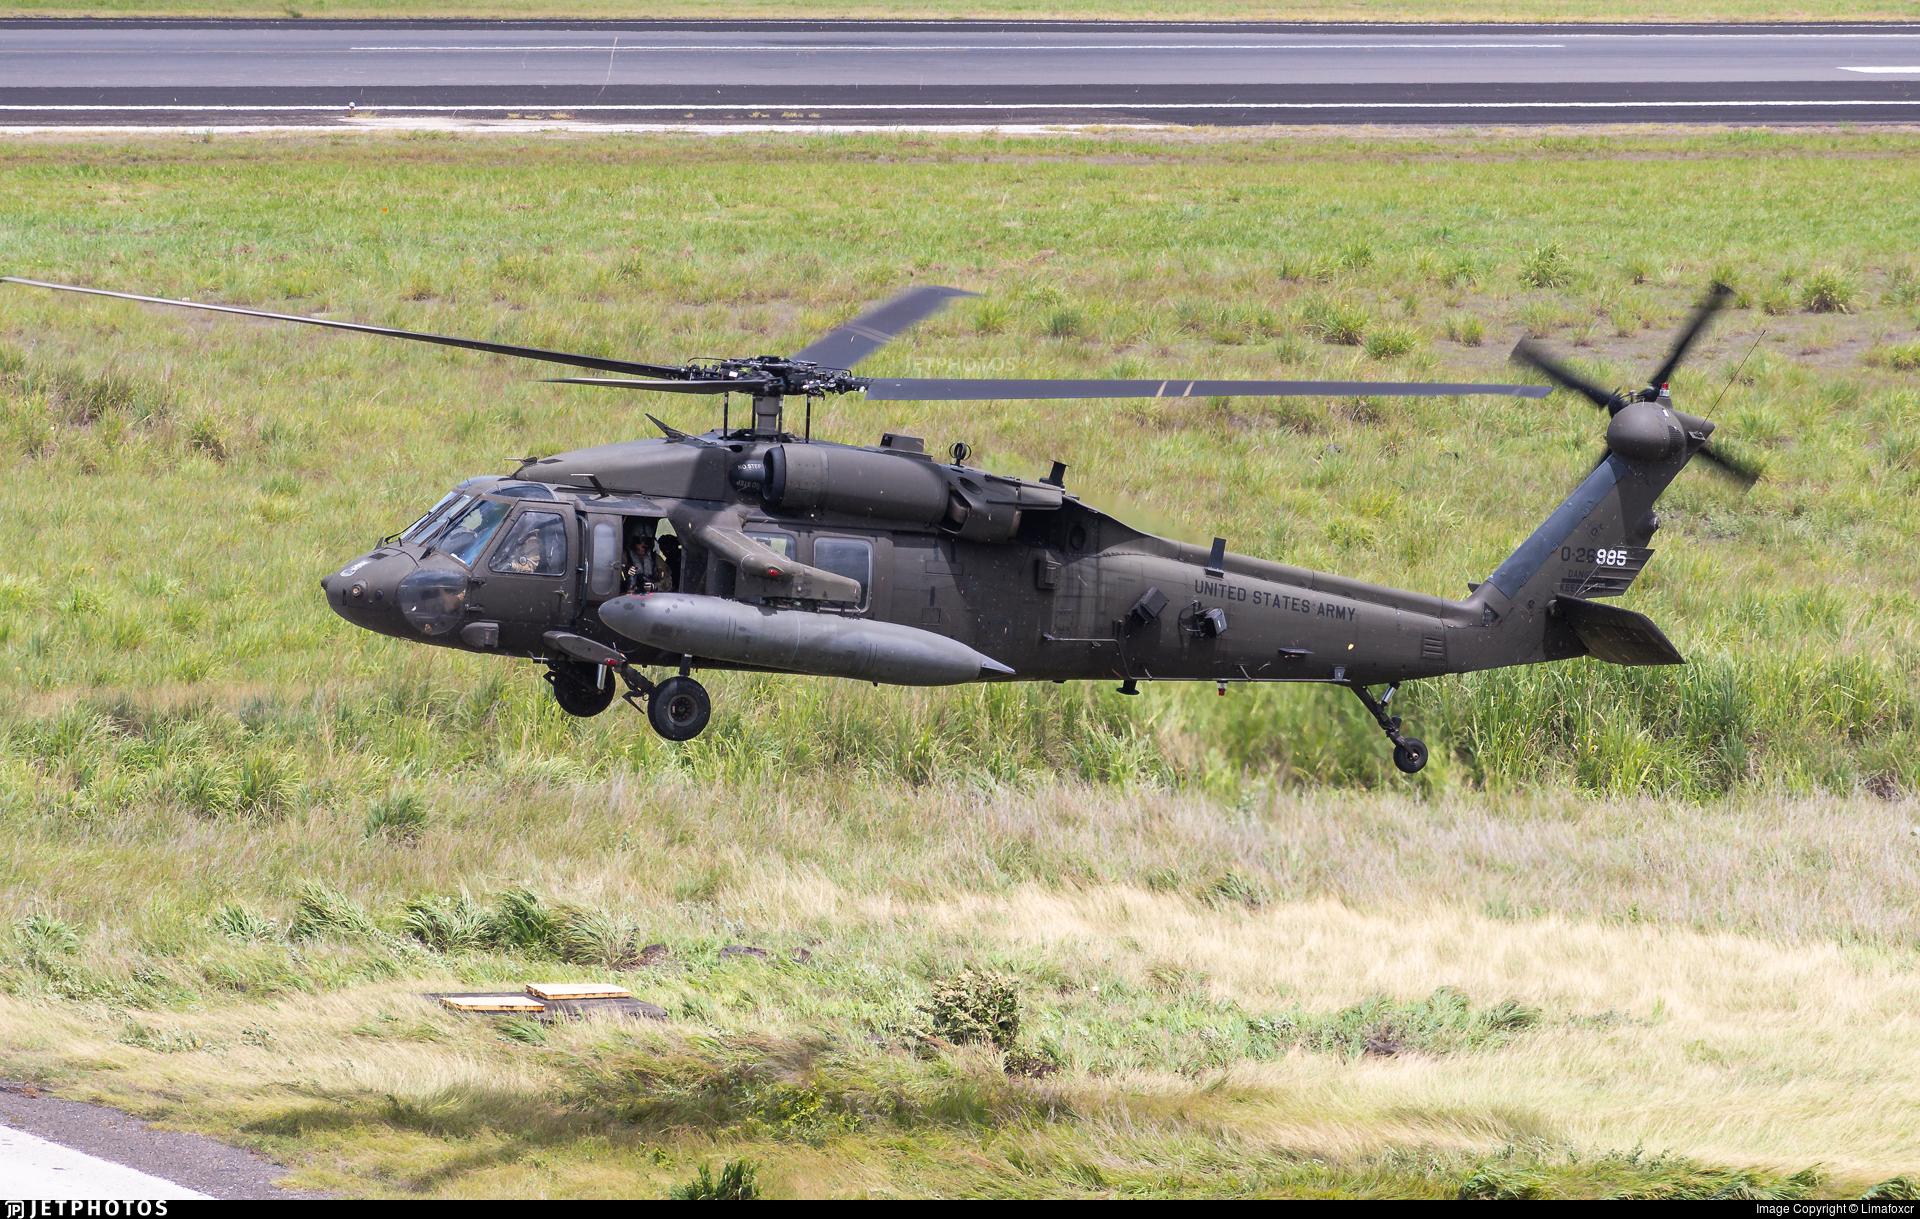 03-26985 - Sikorsky UH-60L Blackhawk - United States - US Army